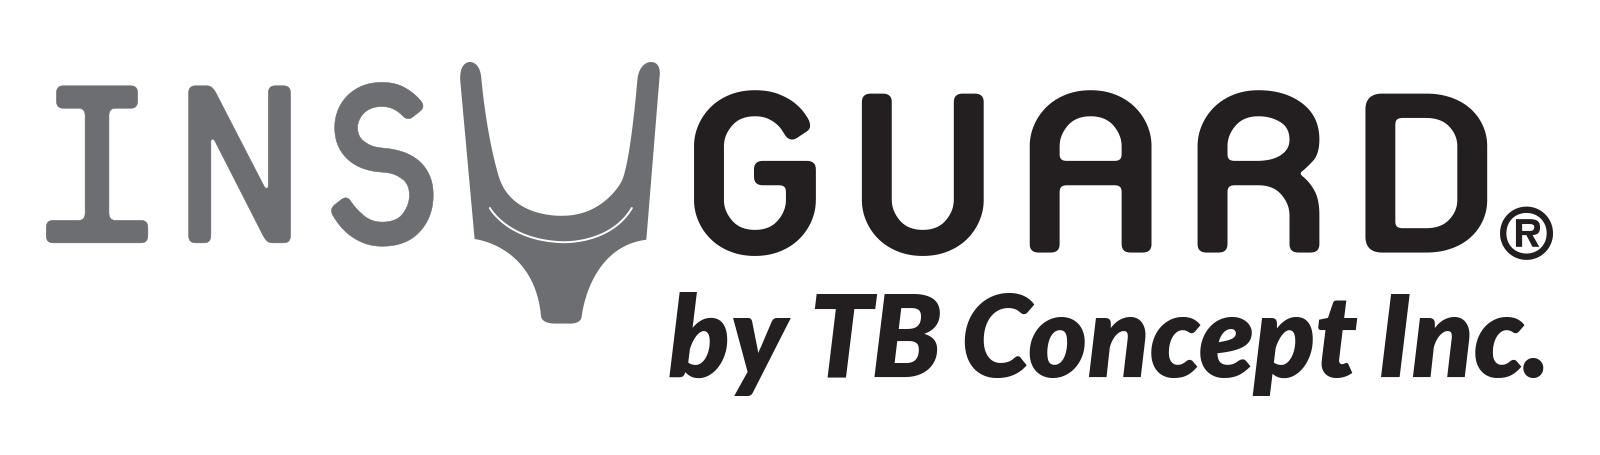 insuguard-by-tb-concept